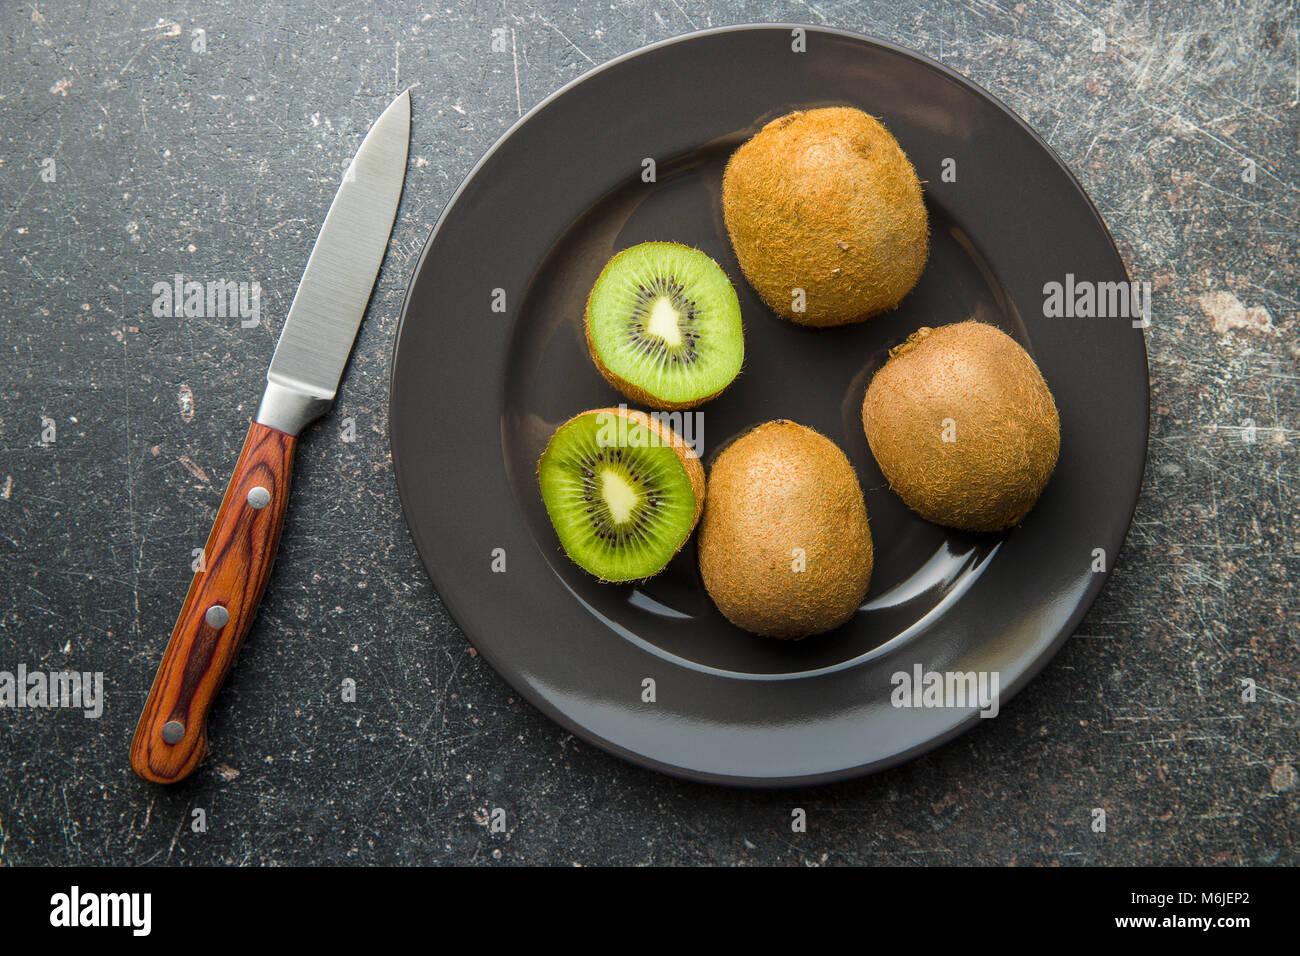 Halved kiwi fruit on plate. - Stock Image